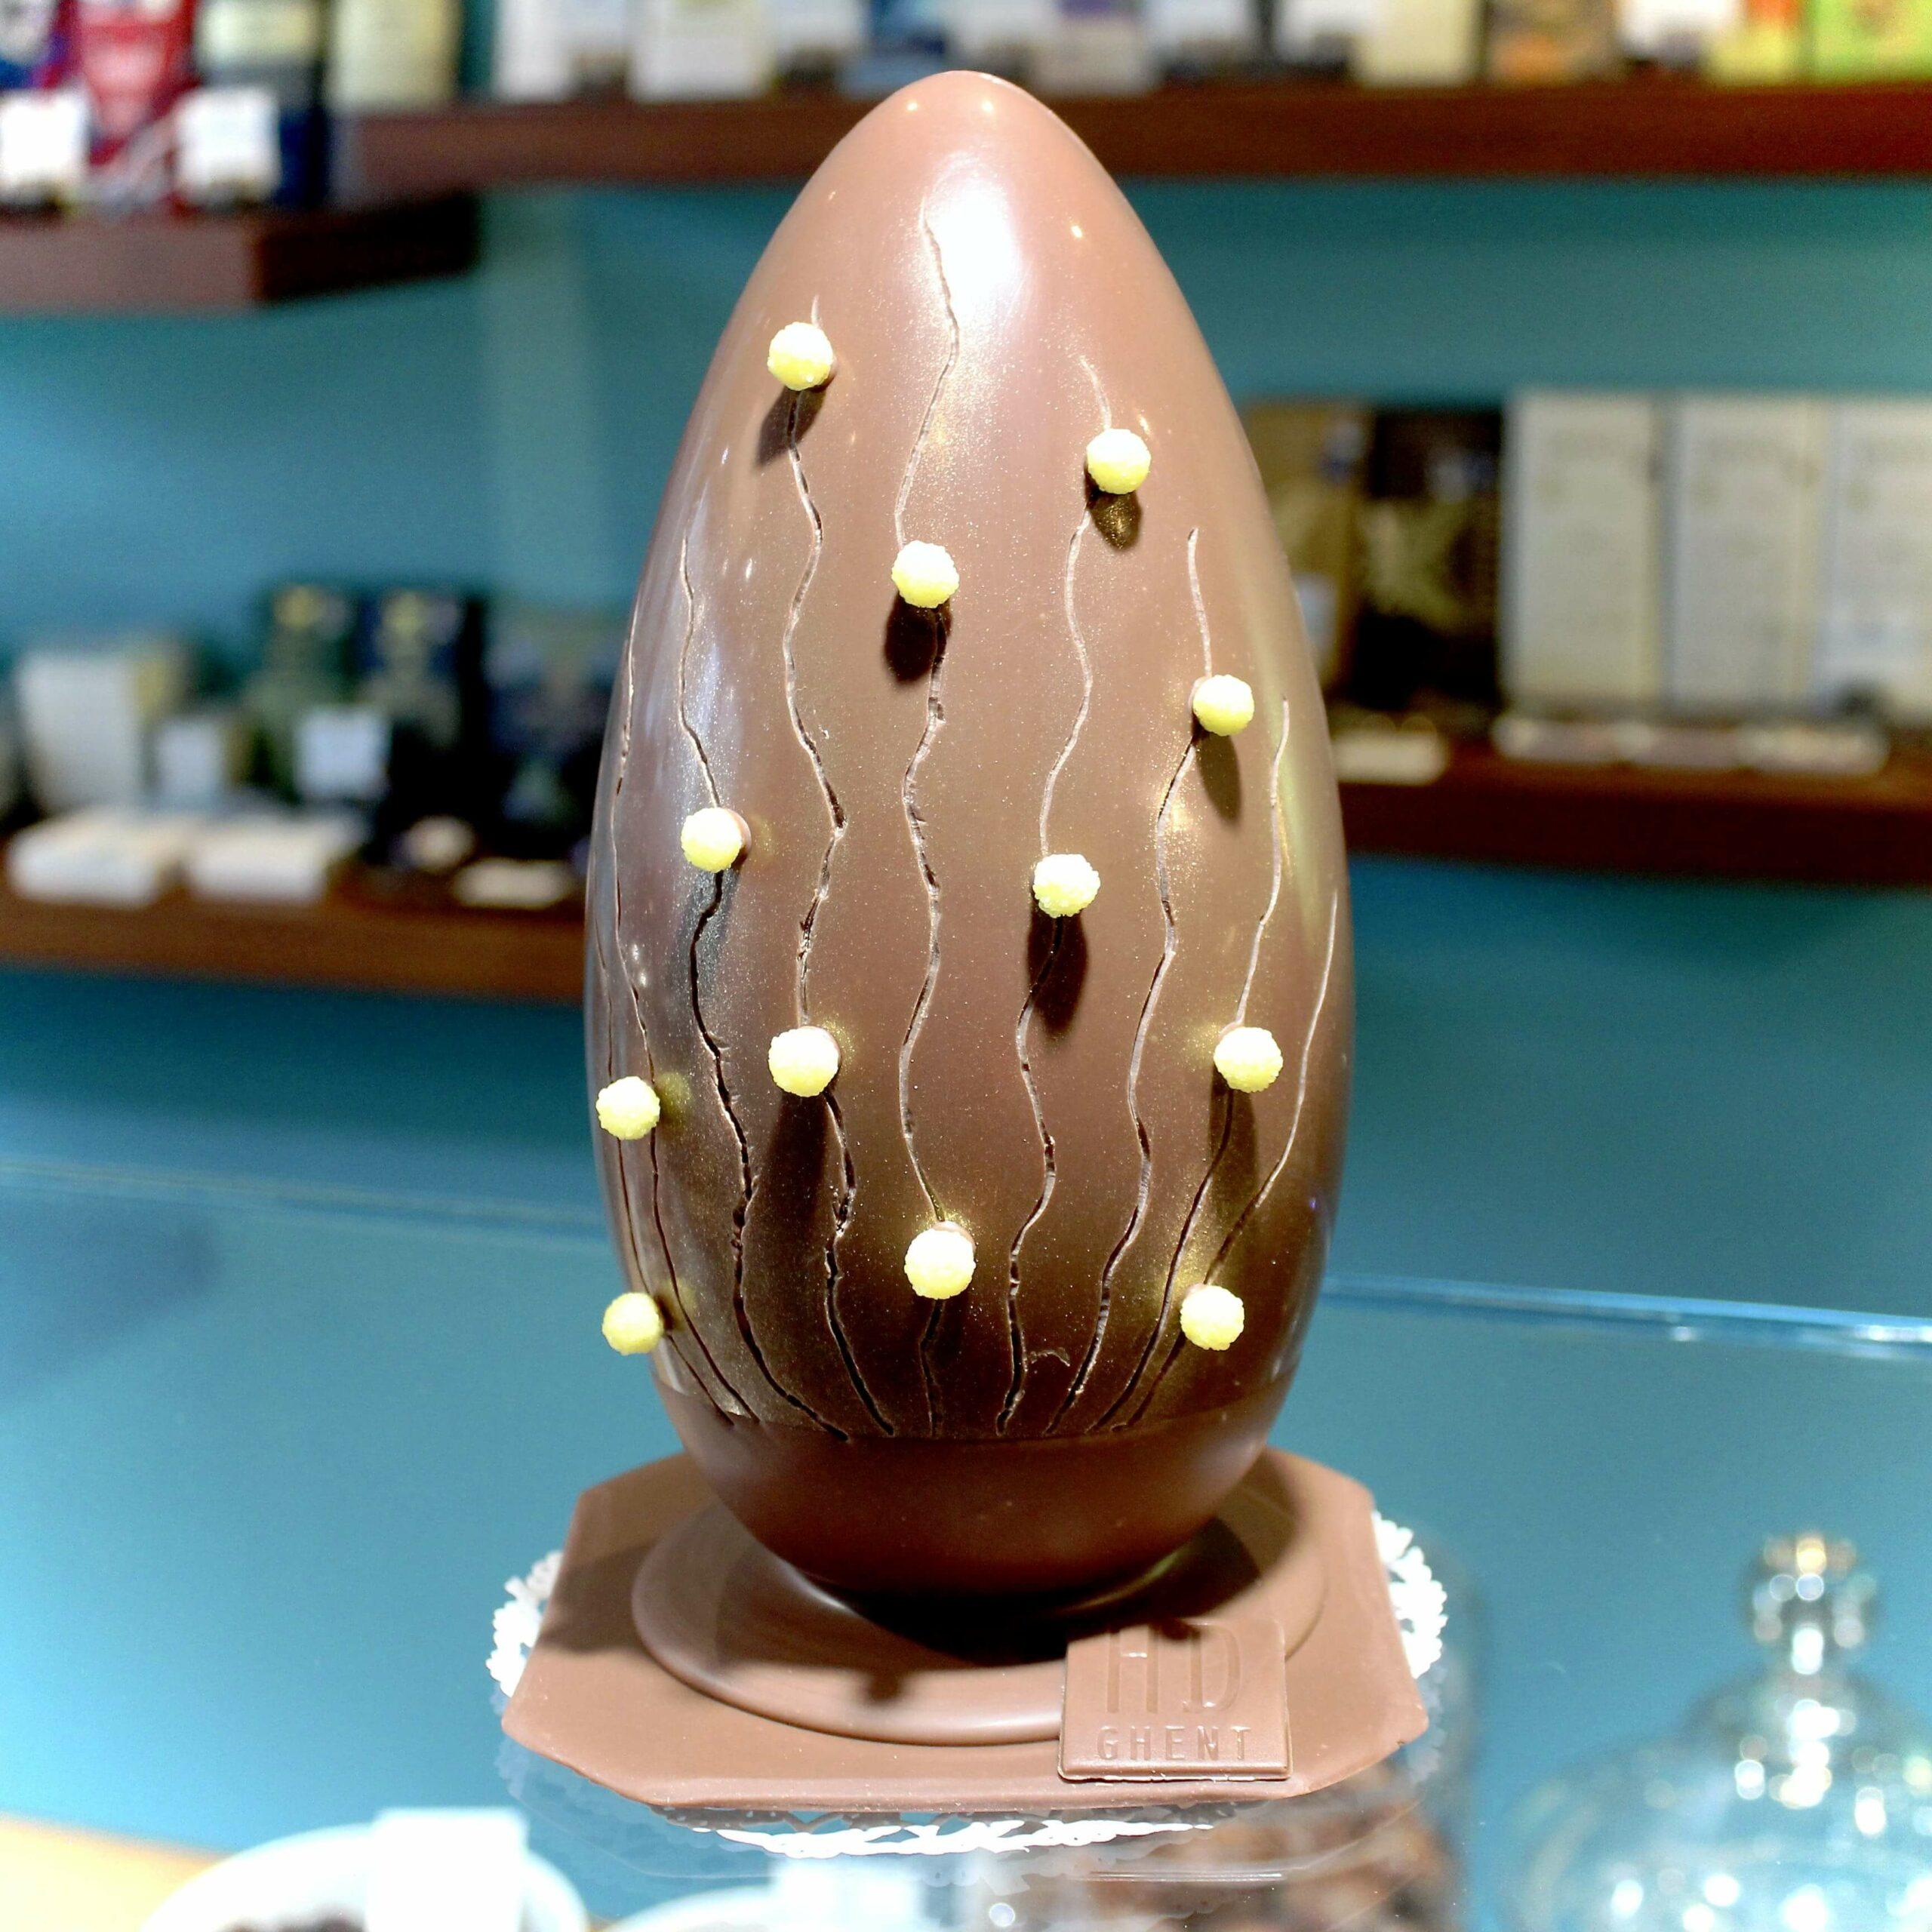 hilde devolder chocolatier easter egg 22 cm milk chocolate 39 peru organic mimosa flowers